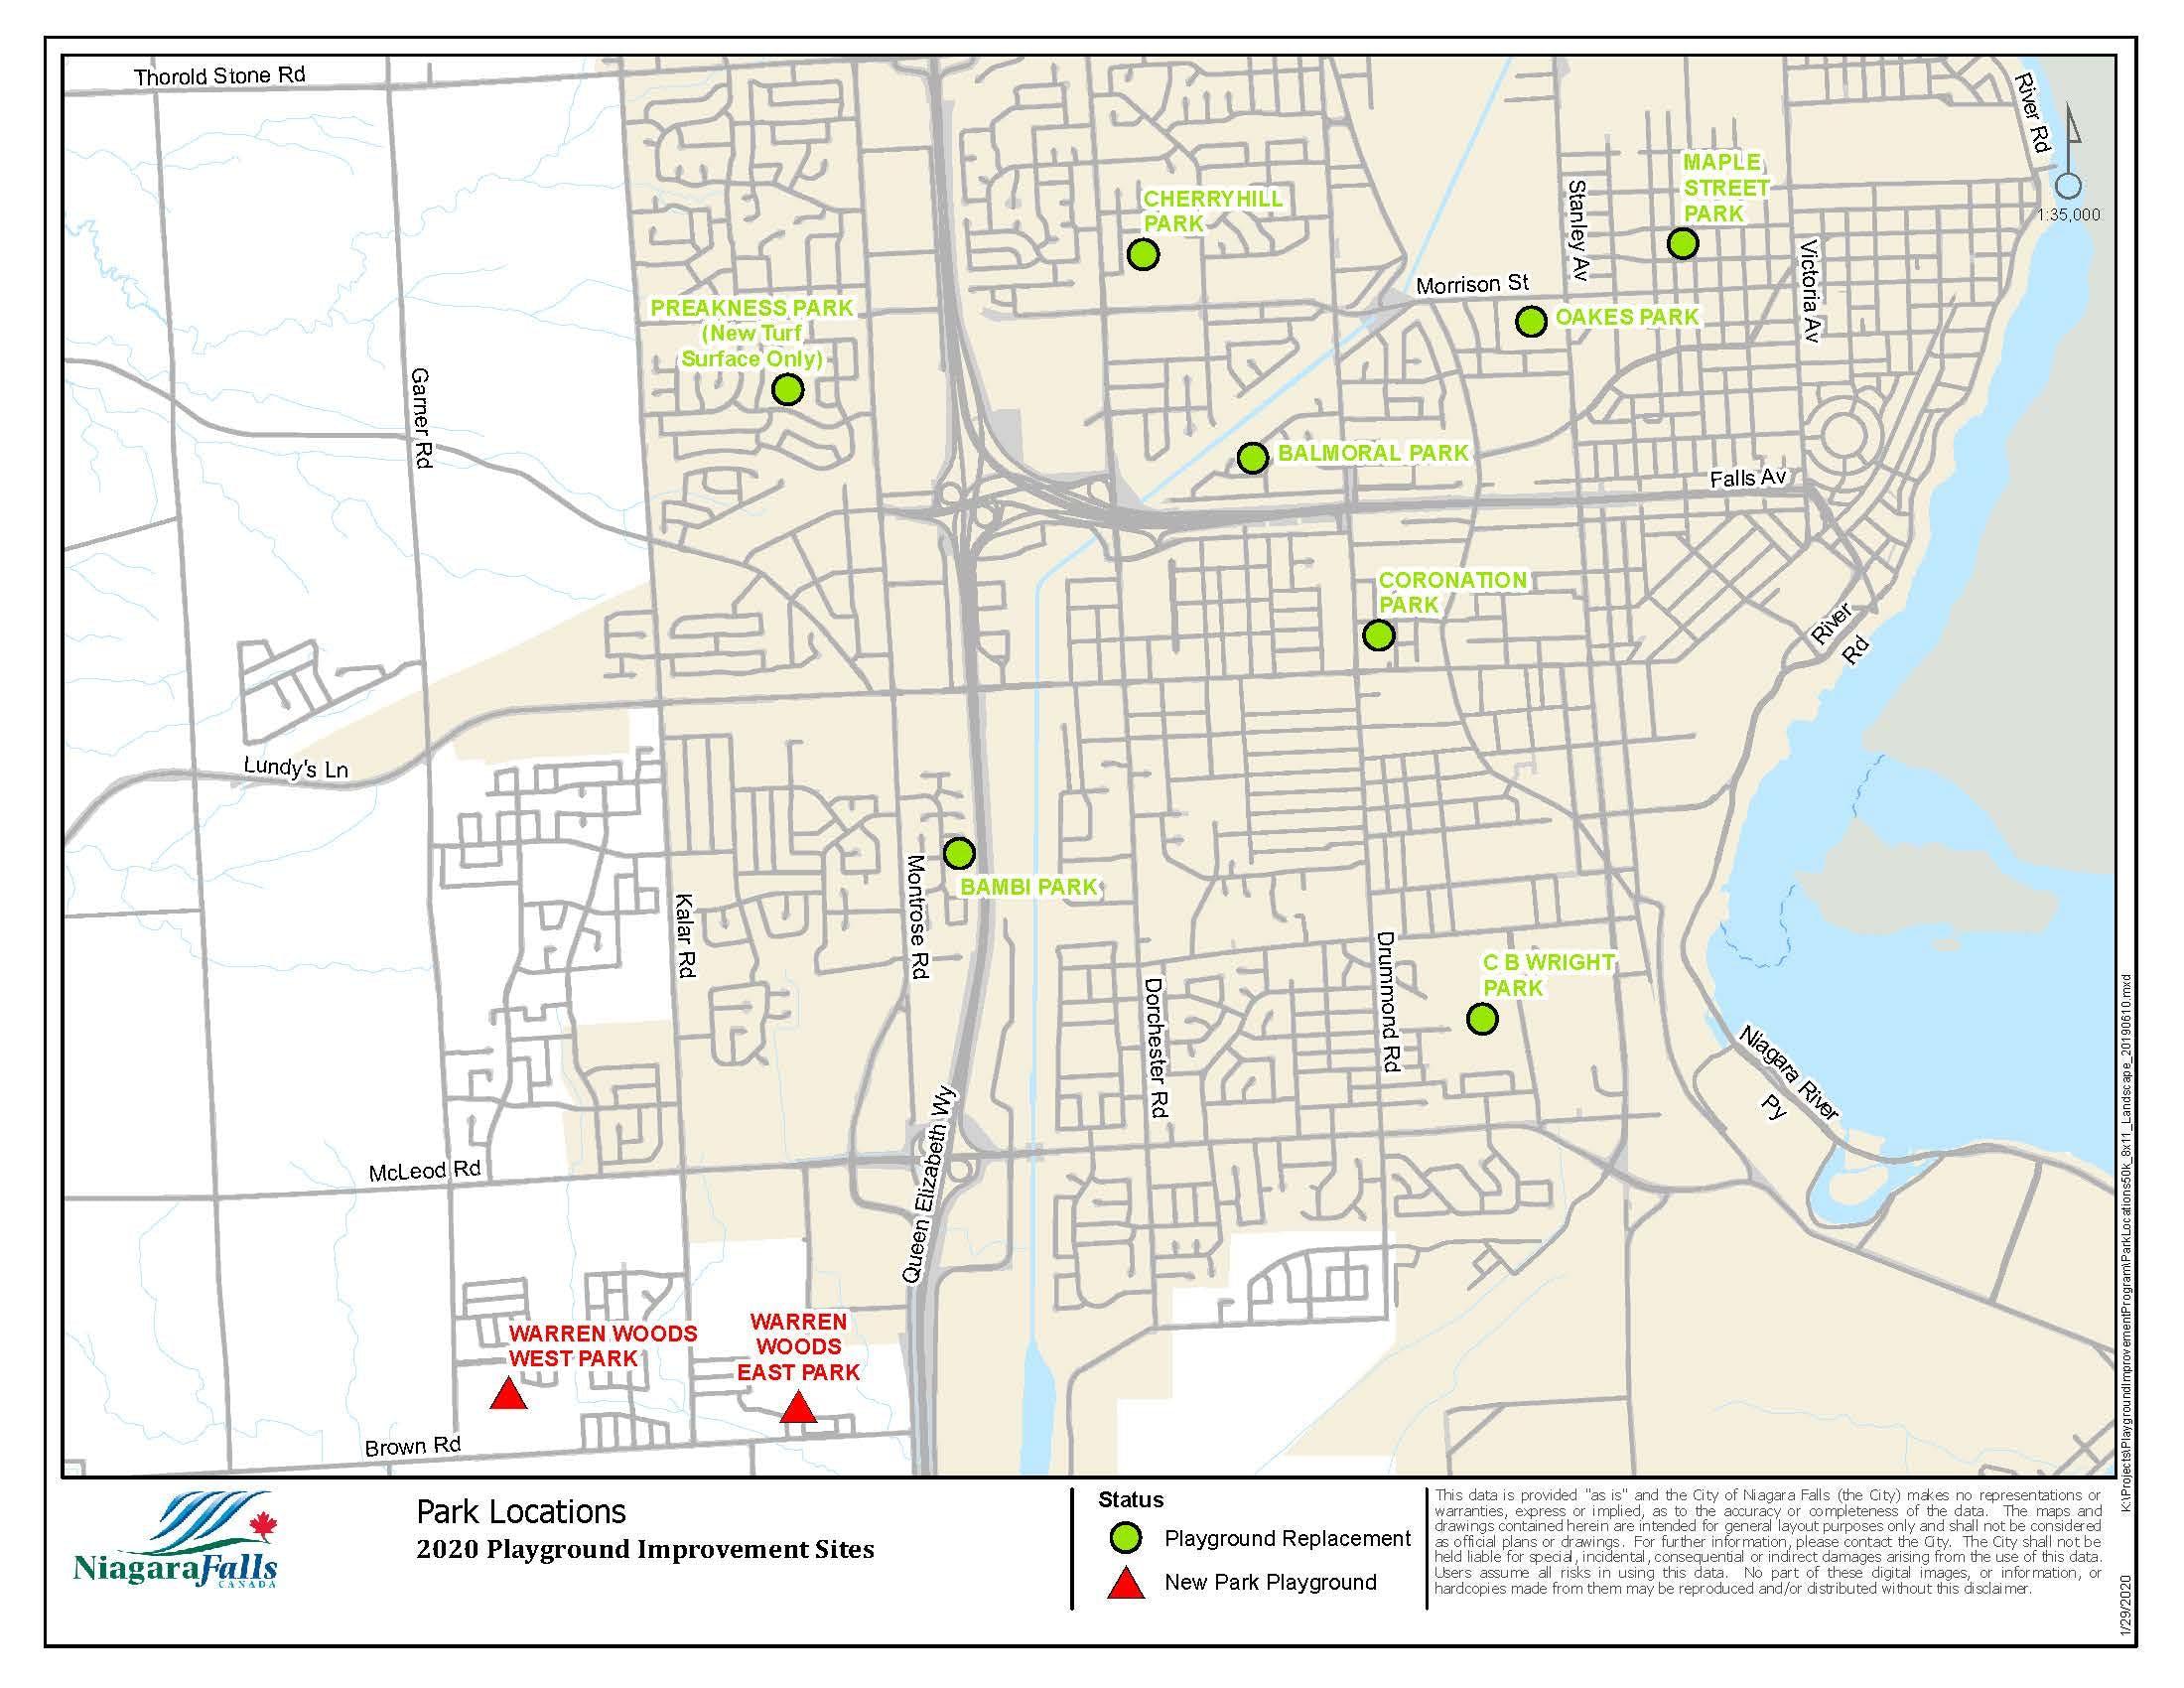 2020 Playground Improvement Sites: Park Locations